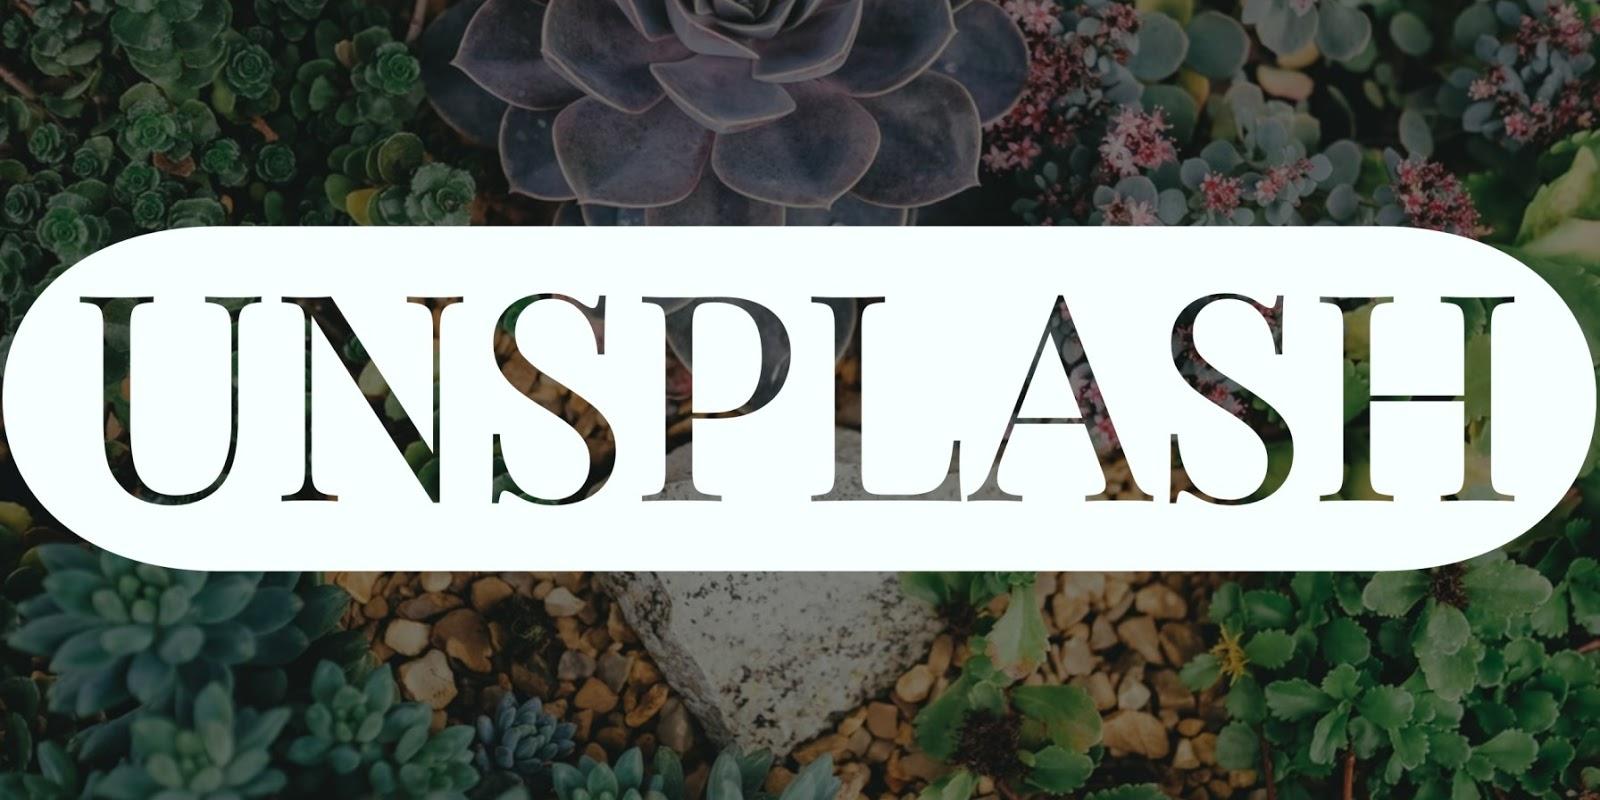 Unsplash - Free Stock Photography Images Sites